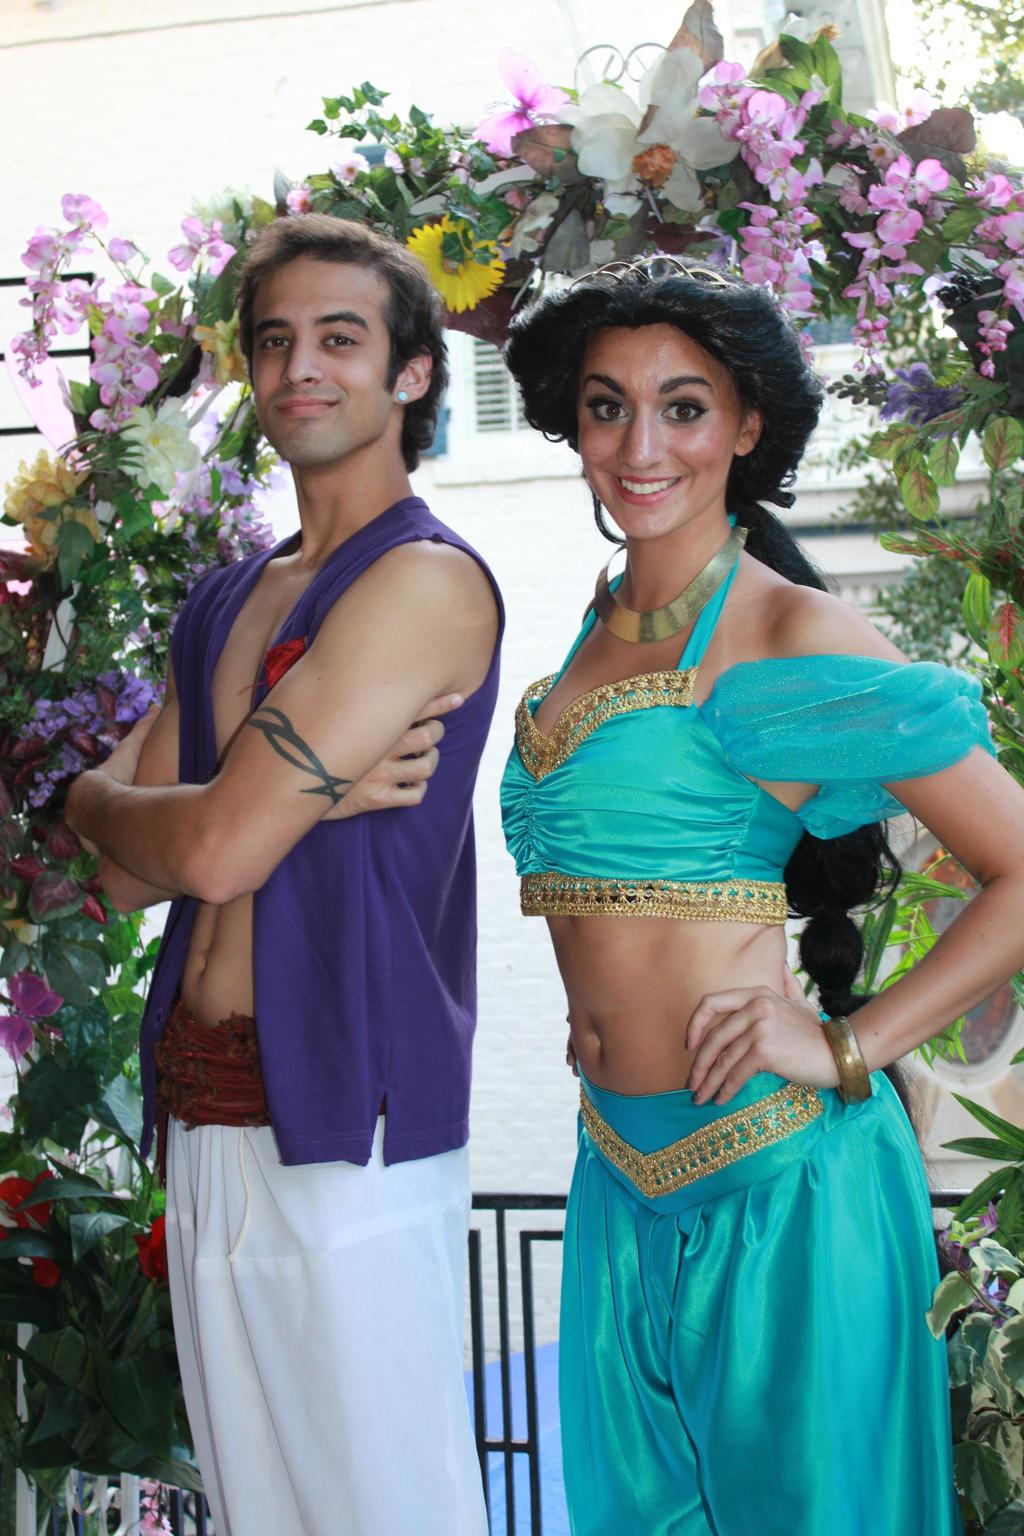 Aladdin and Jasmine by Darkmoonwanted